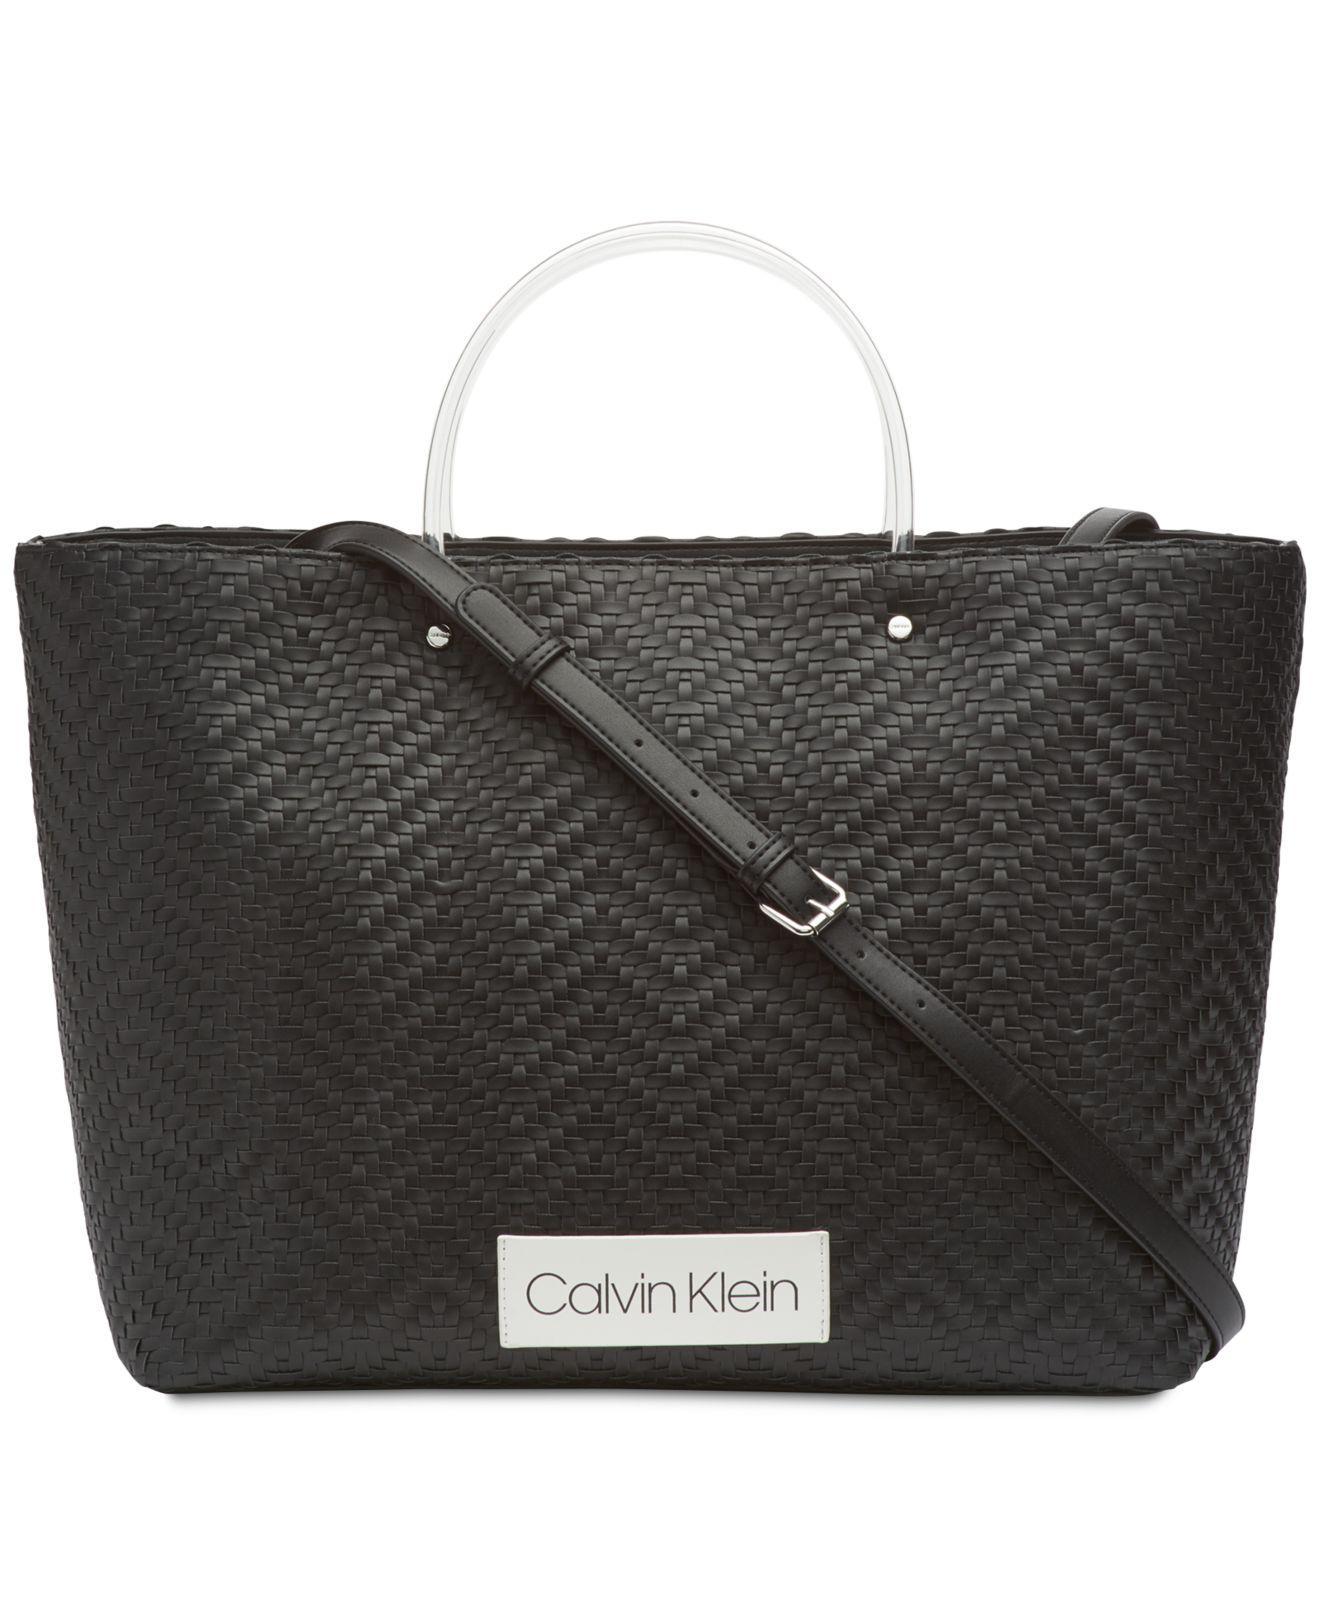 f1ee6ad379 Calvin Klein - Black Morgan Large Tote - Lyst. View fullscreen